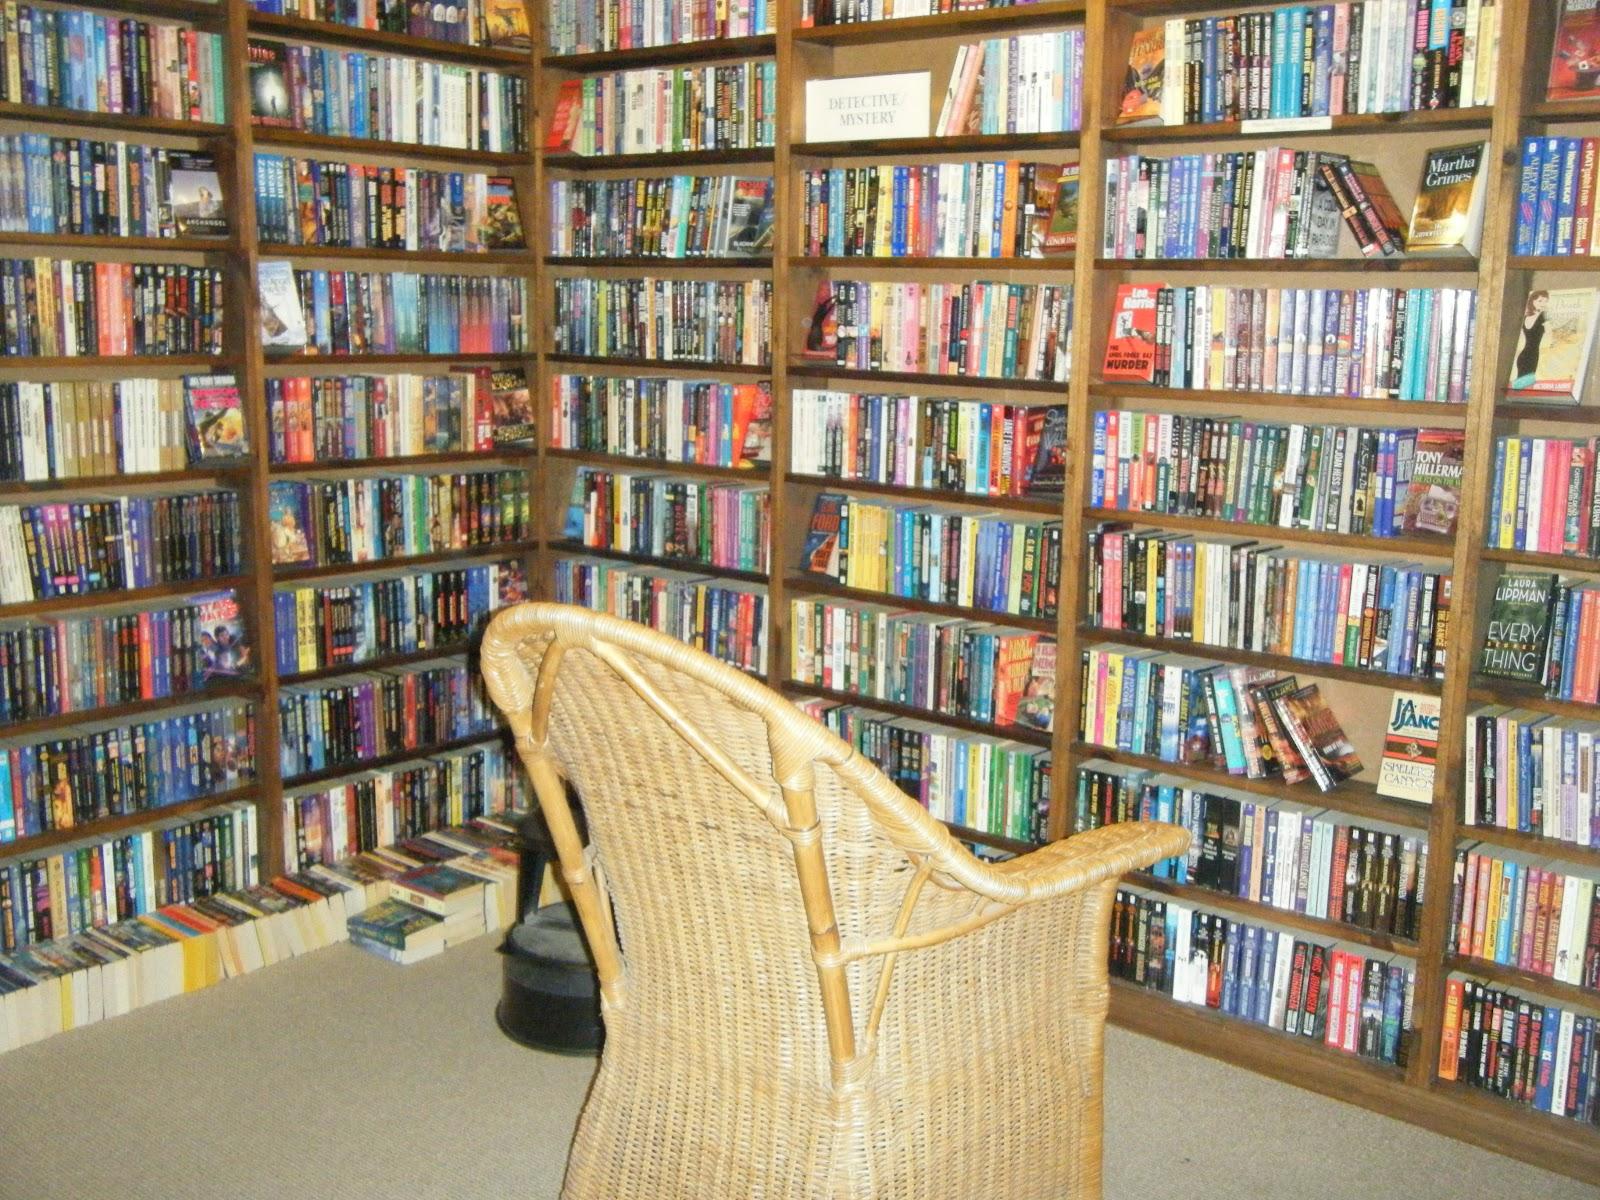 All Things Books The Dusty Bookshelf Lawrence Kansas